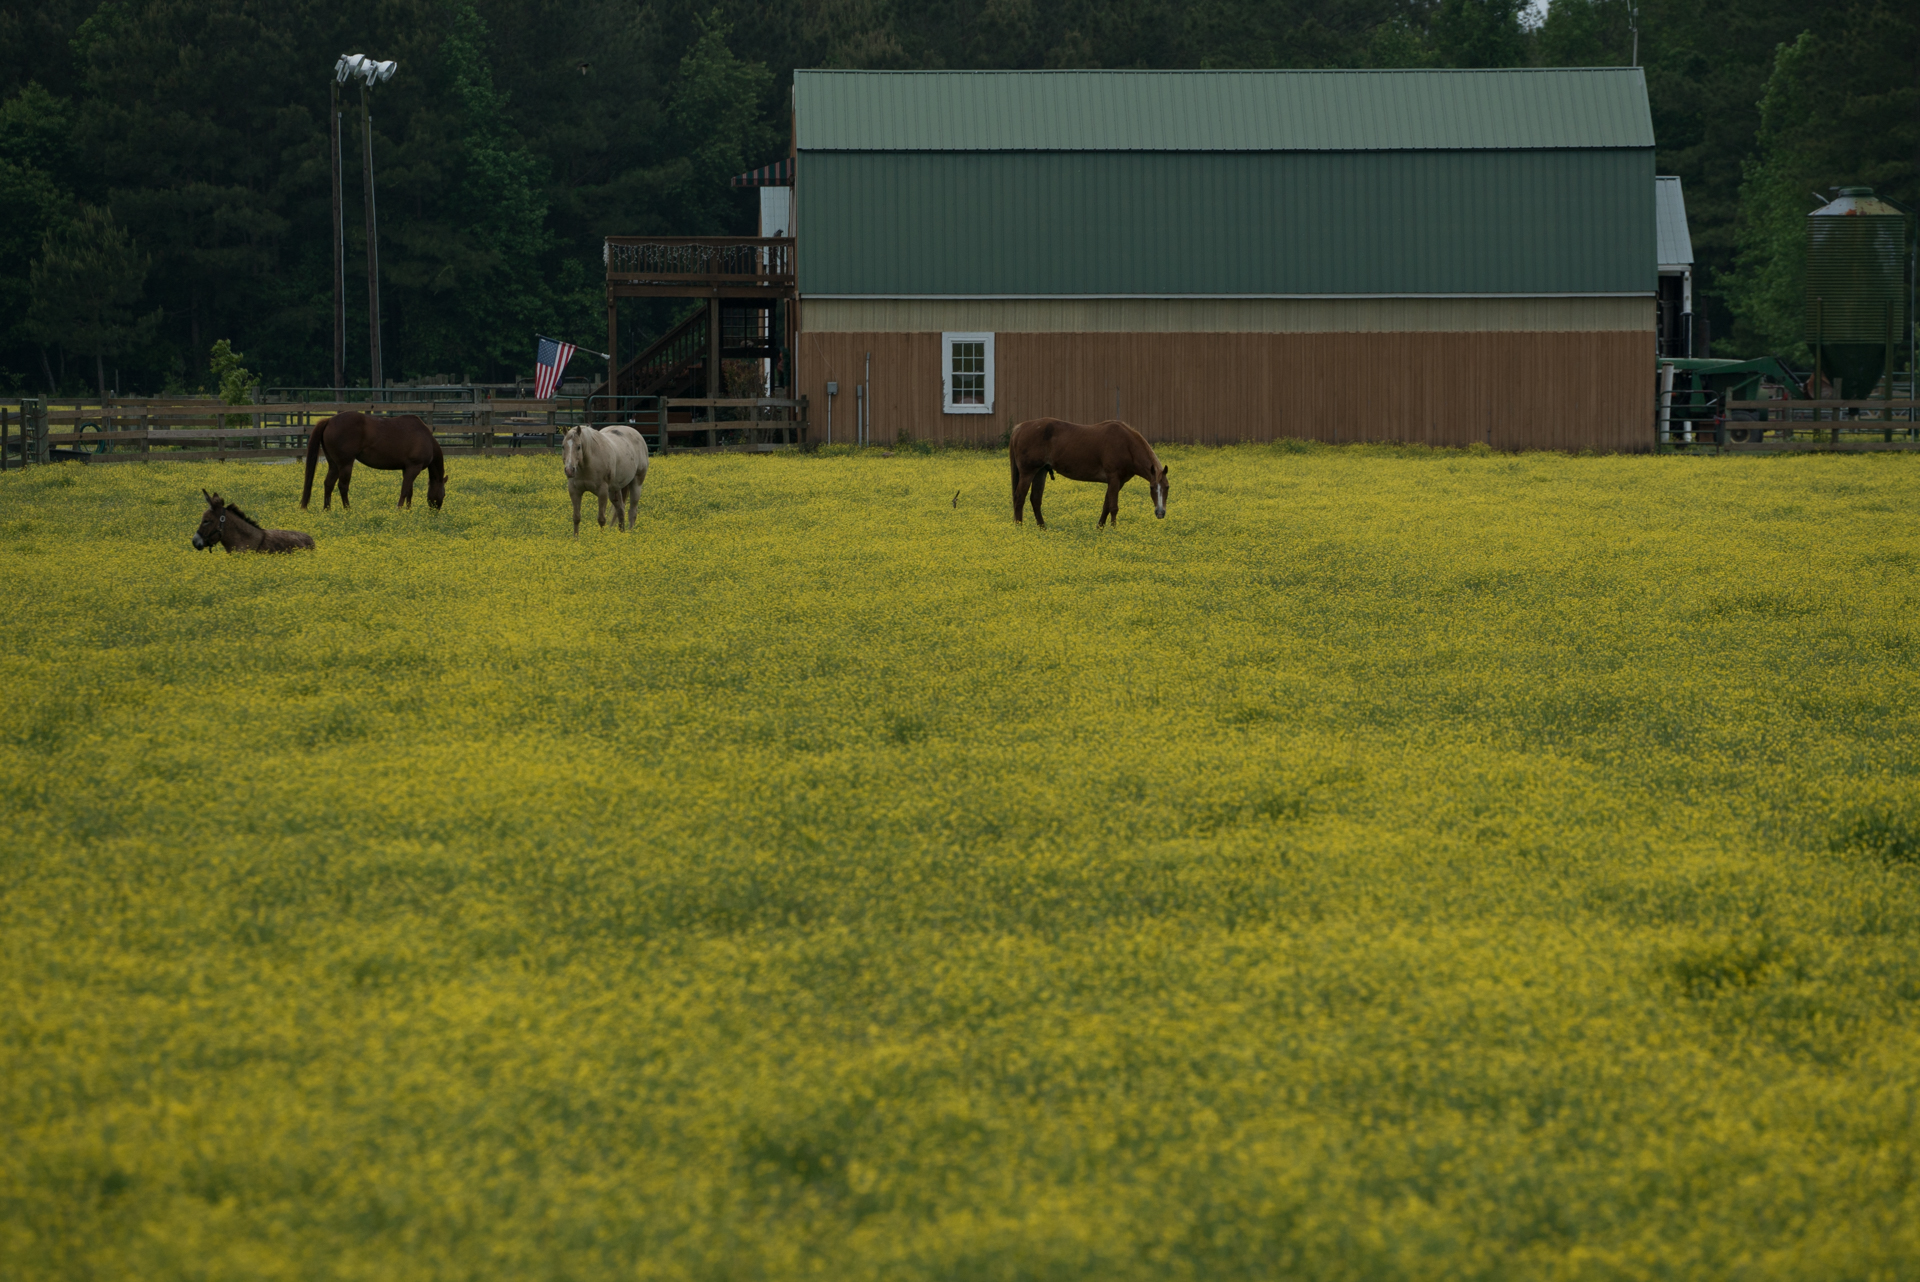 Map:2.  Farm near Belhaven, North Carolina